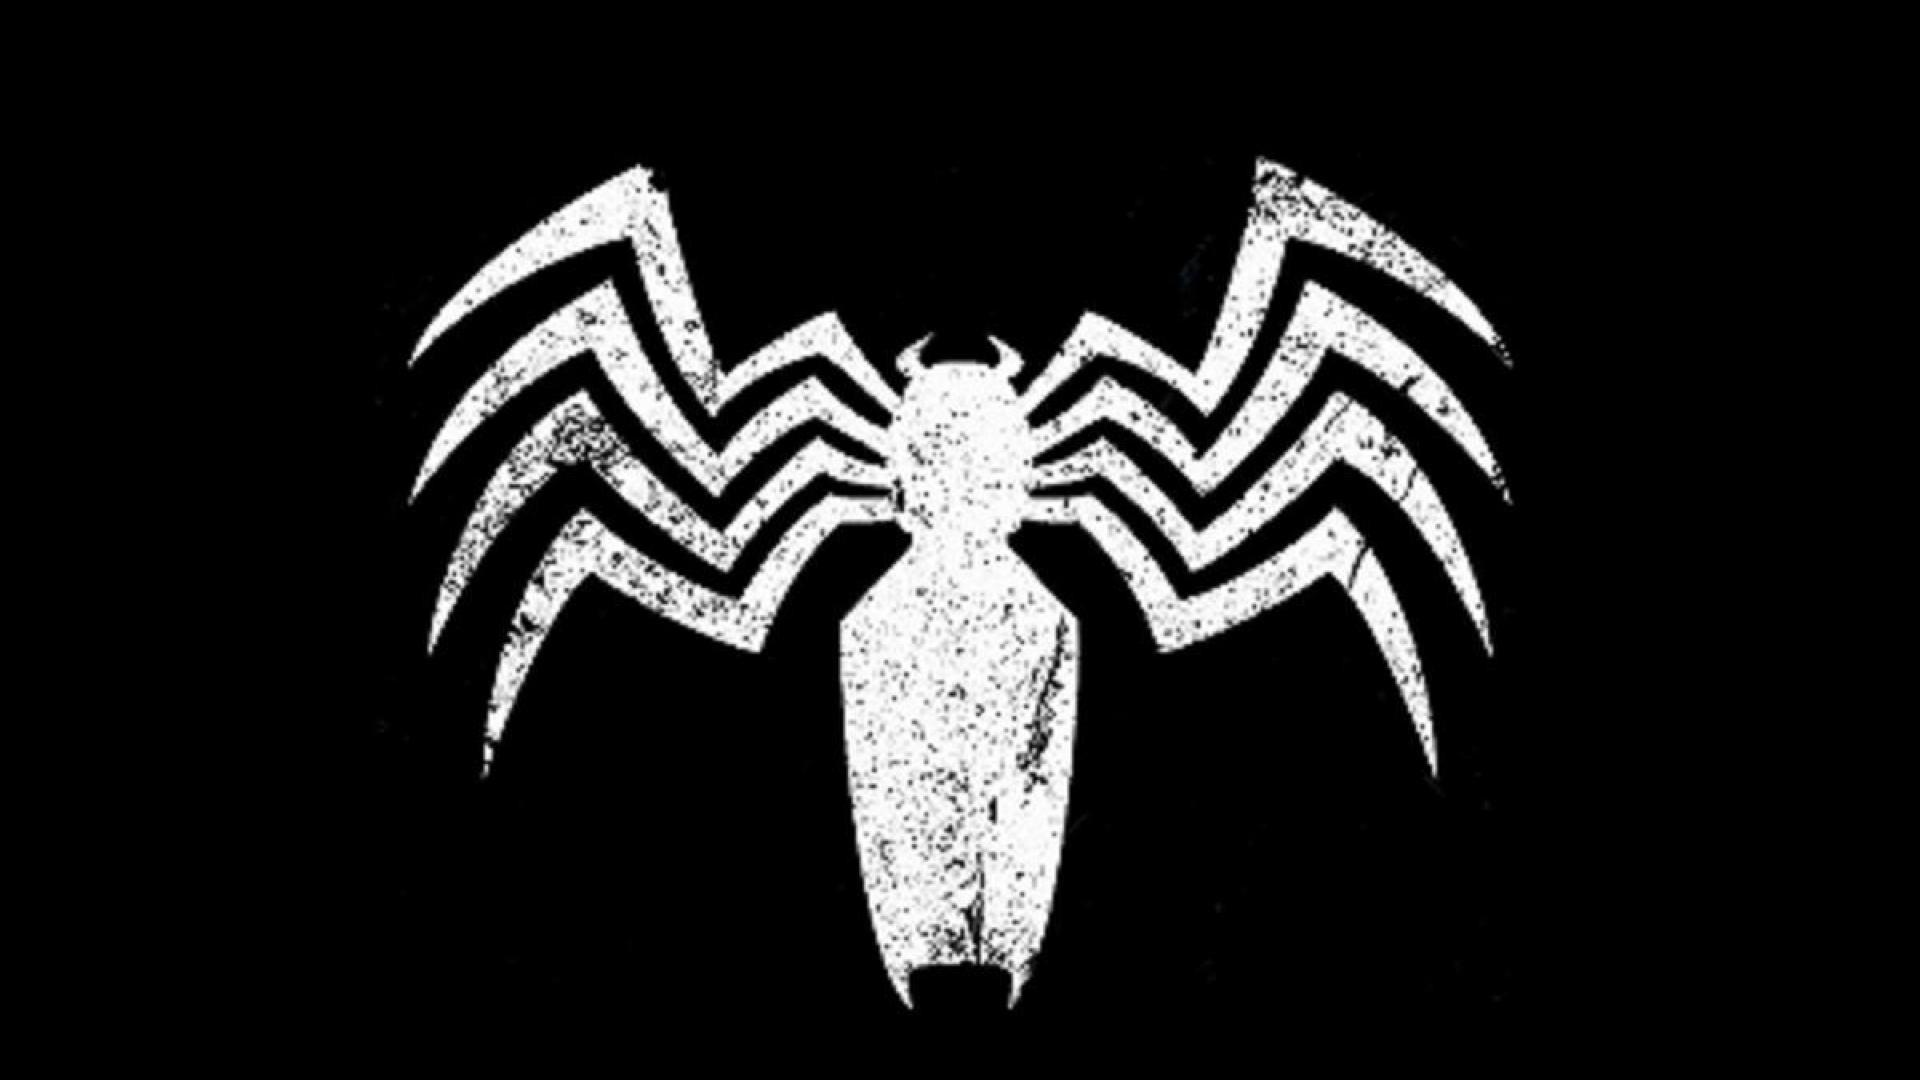 Wallpapers For > Venom Hd Wallpaper 1920×1080